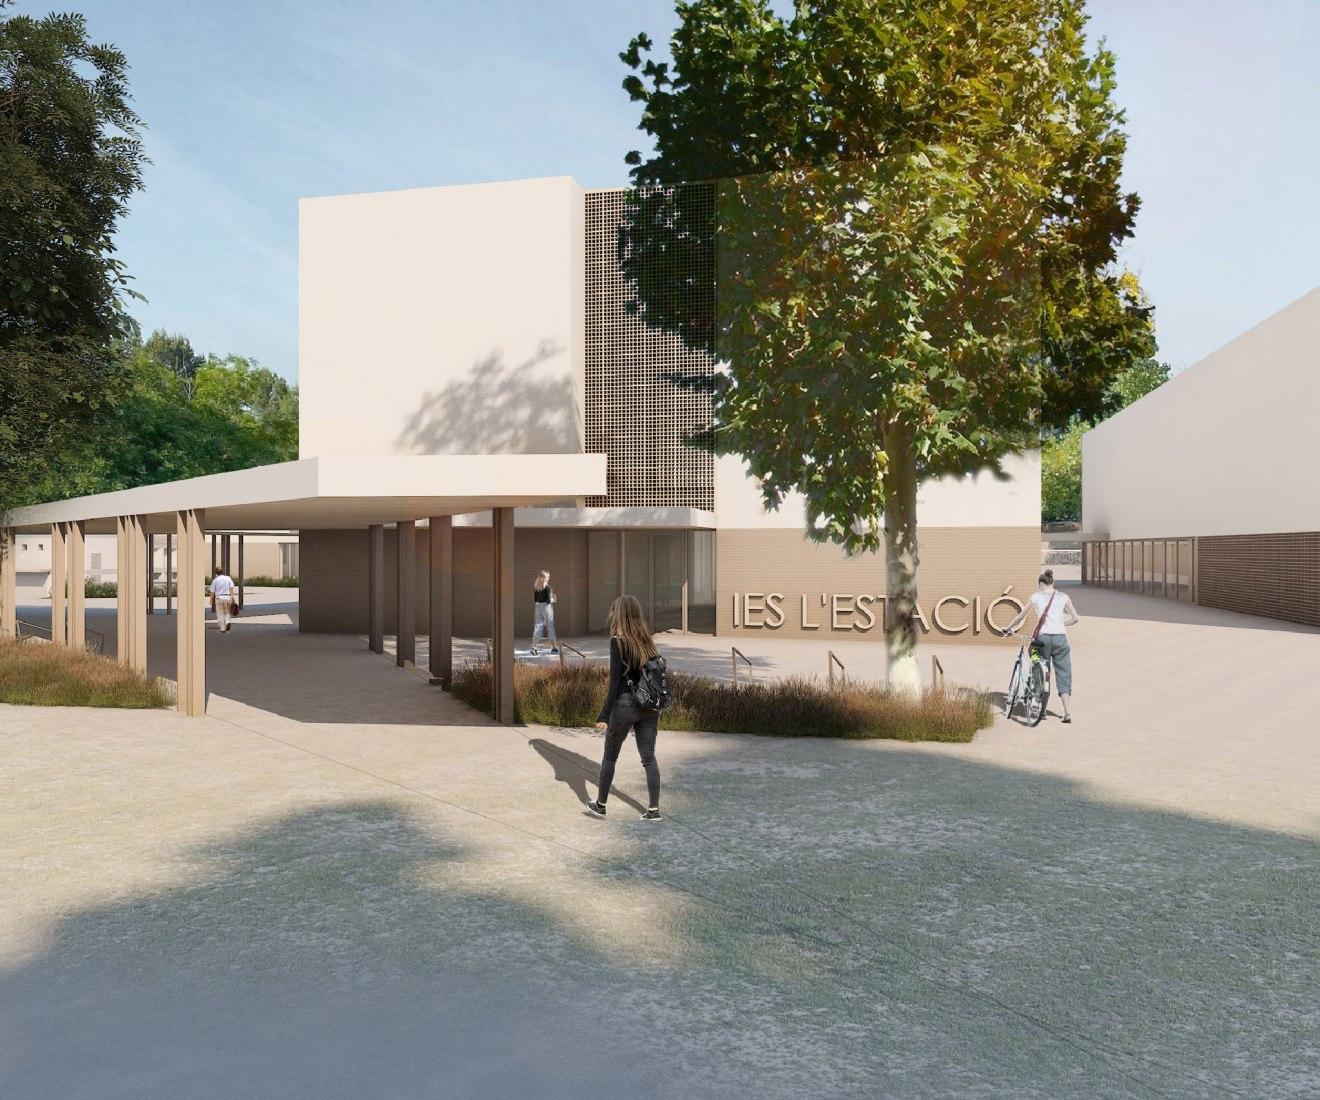 Rendering. L'Estació High School by Ramón Esteve. 3D Rendering by Tudi Soriano, Pau Raigal